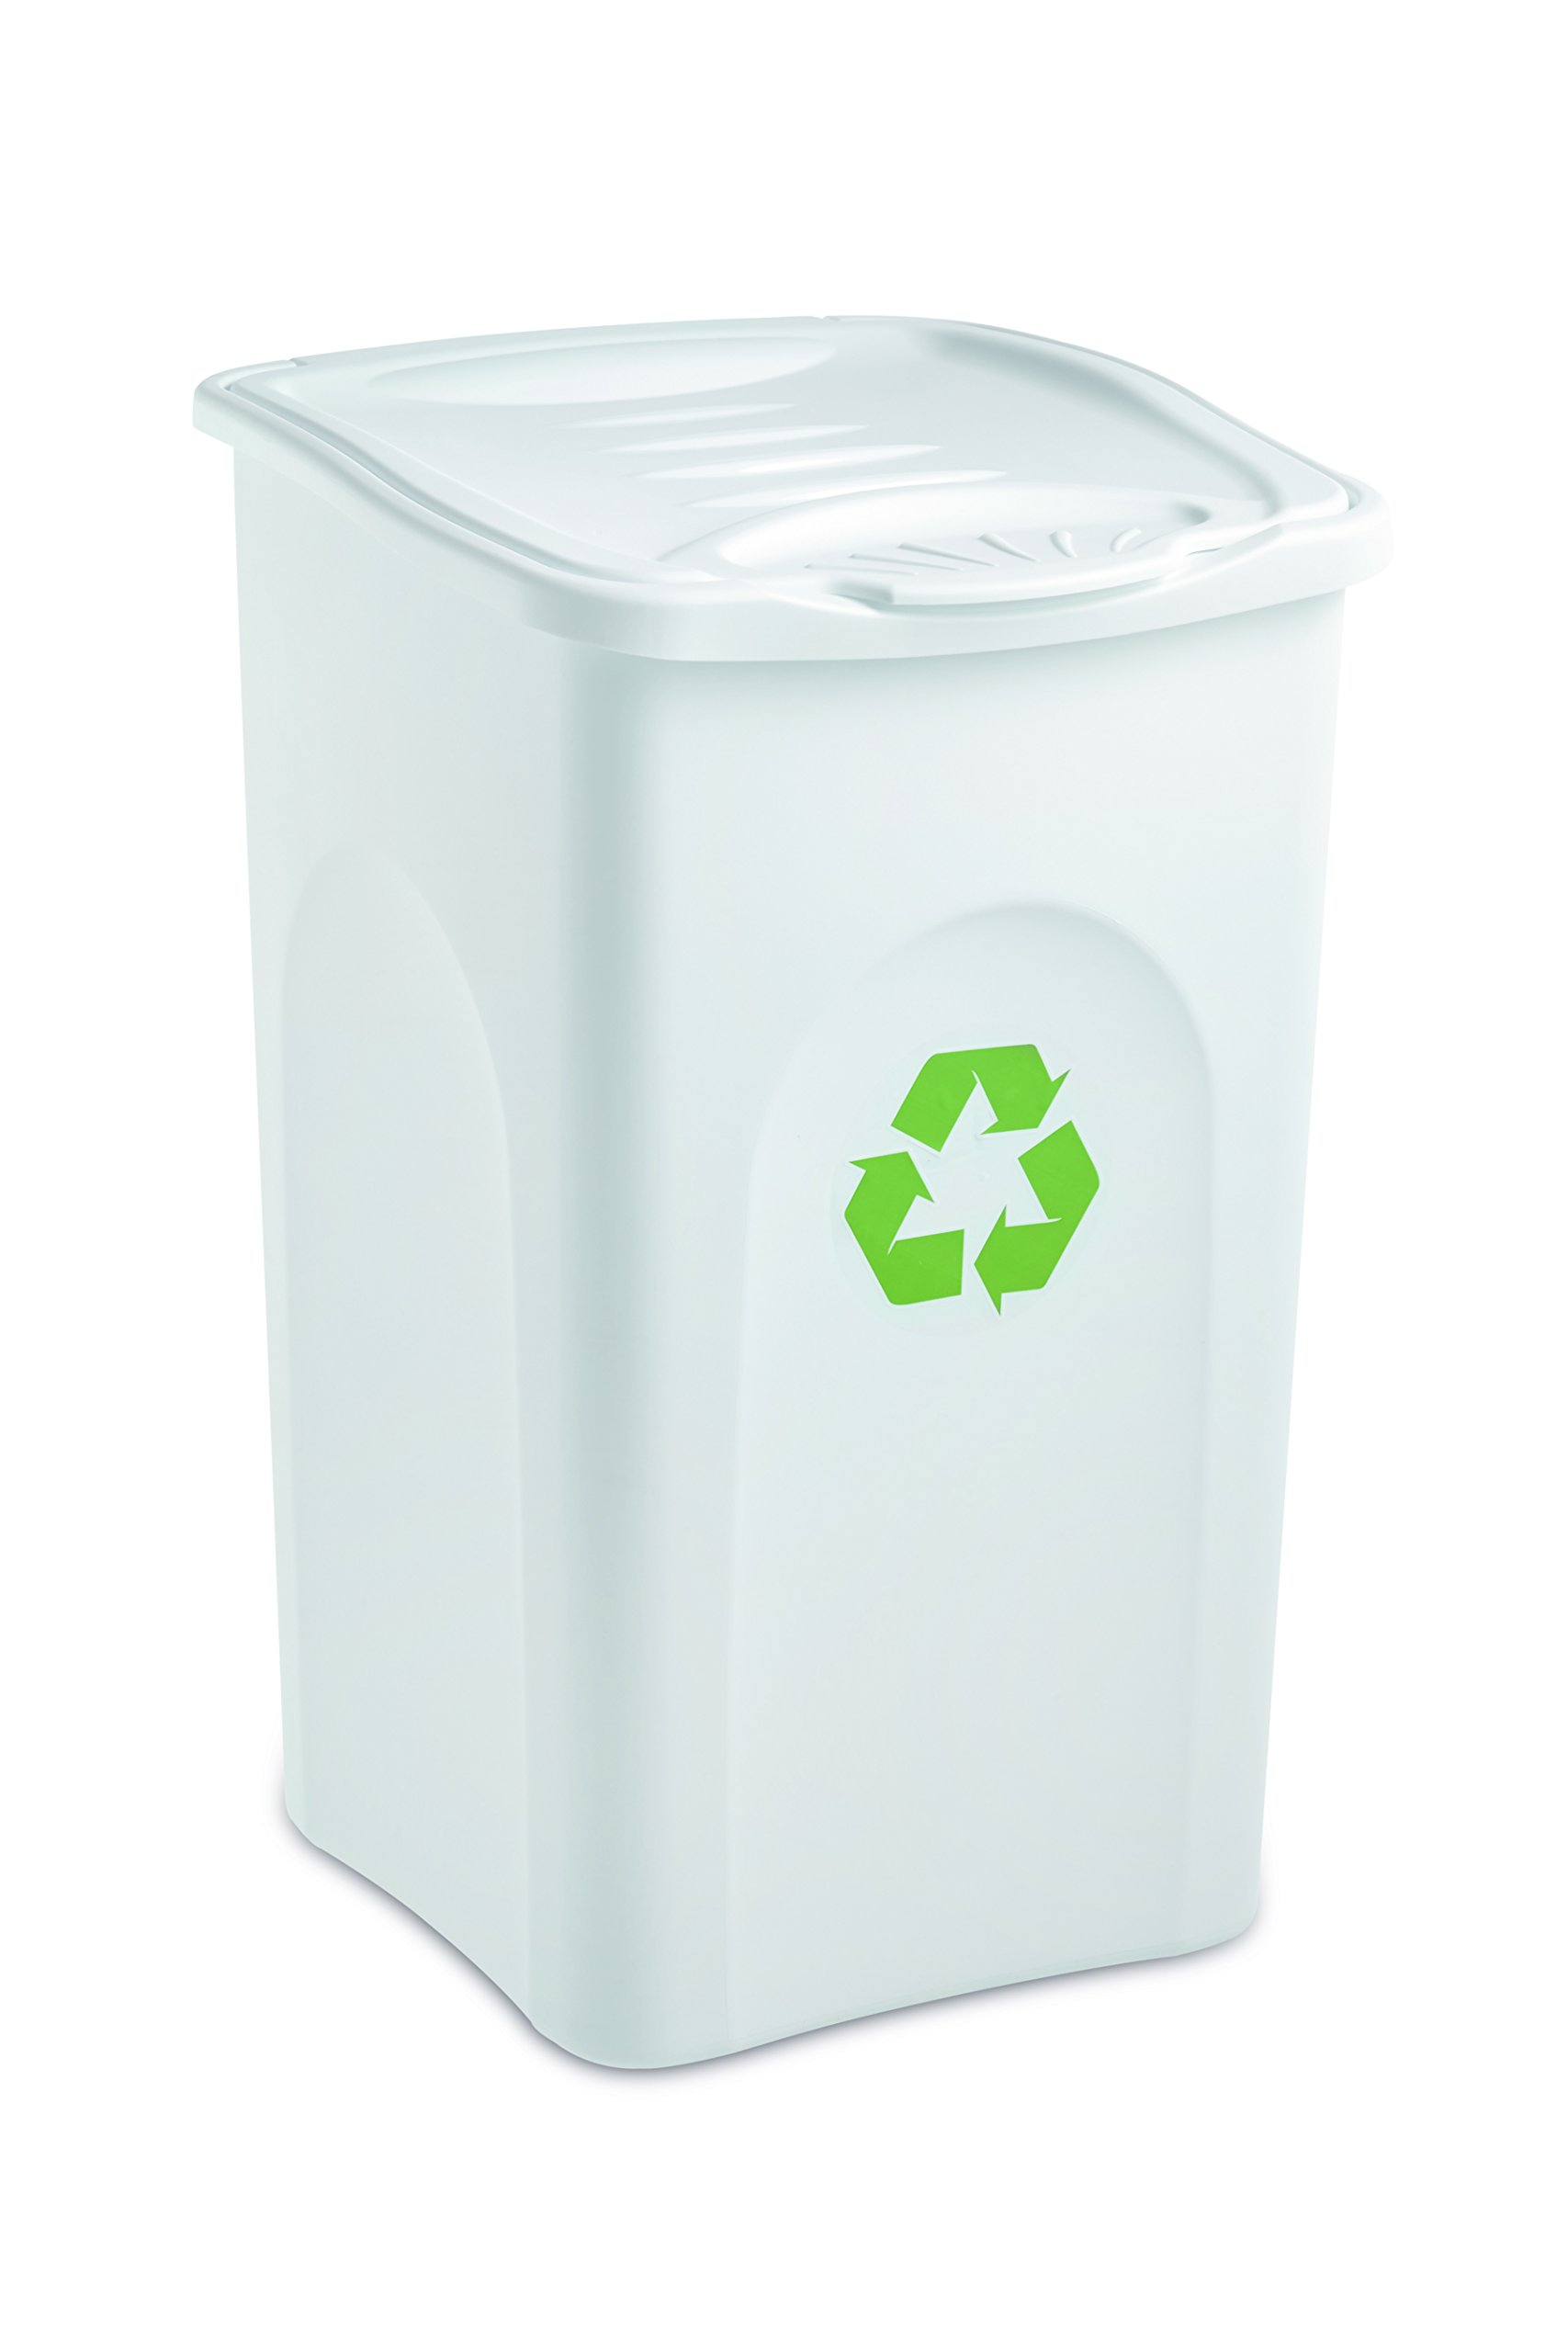 Stefanplast Begreen Bin, 50 L, White